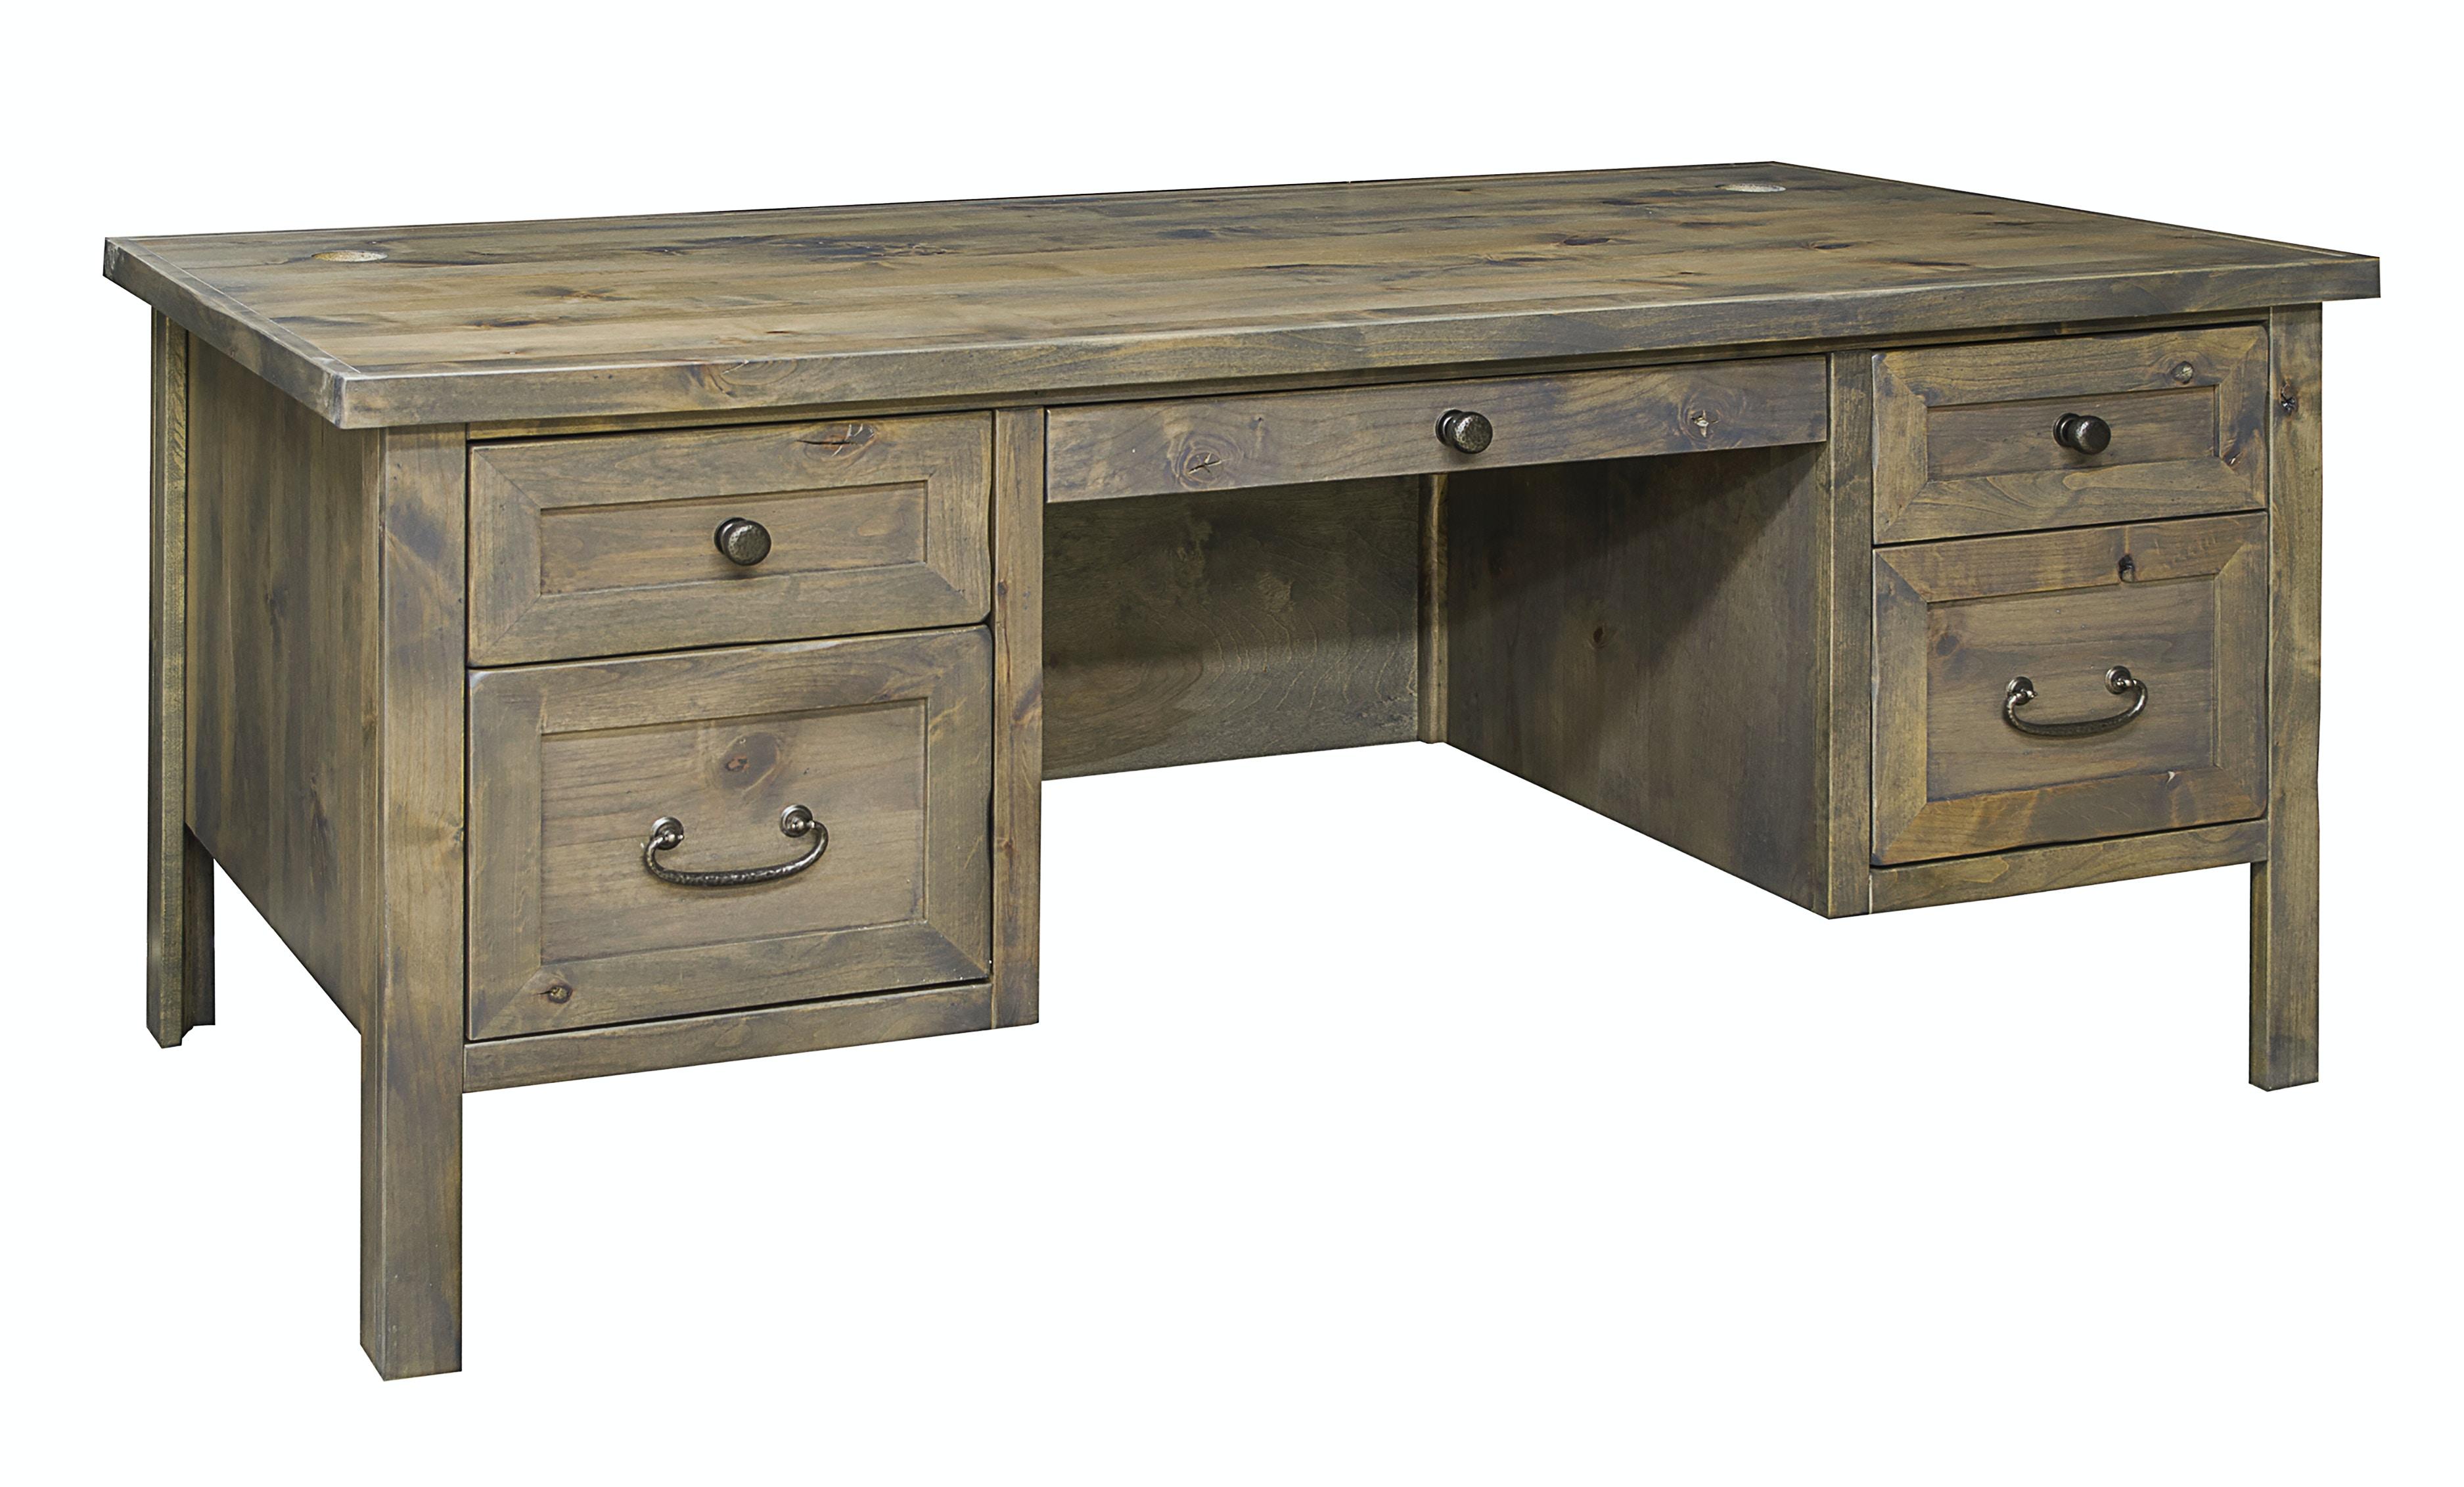 Genial Legends Furniture Joshua Creek Executive Desk JC6270.BNW